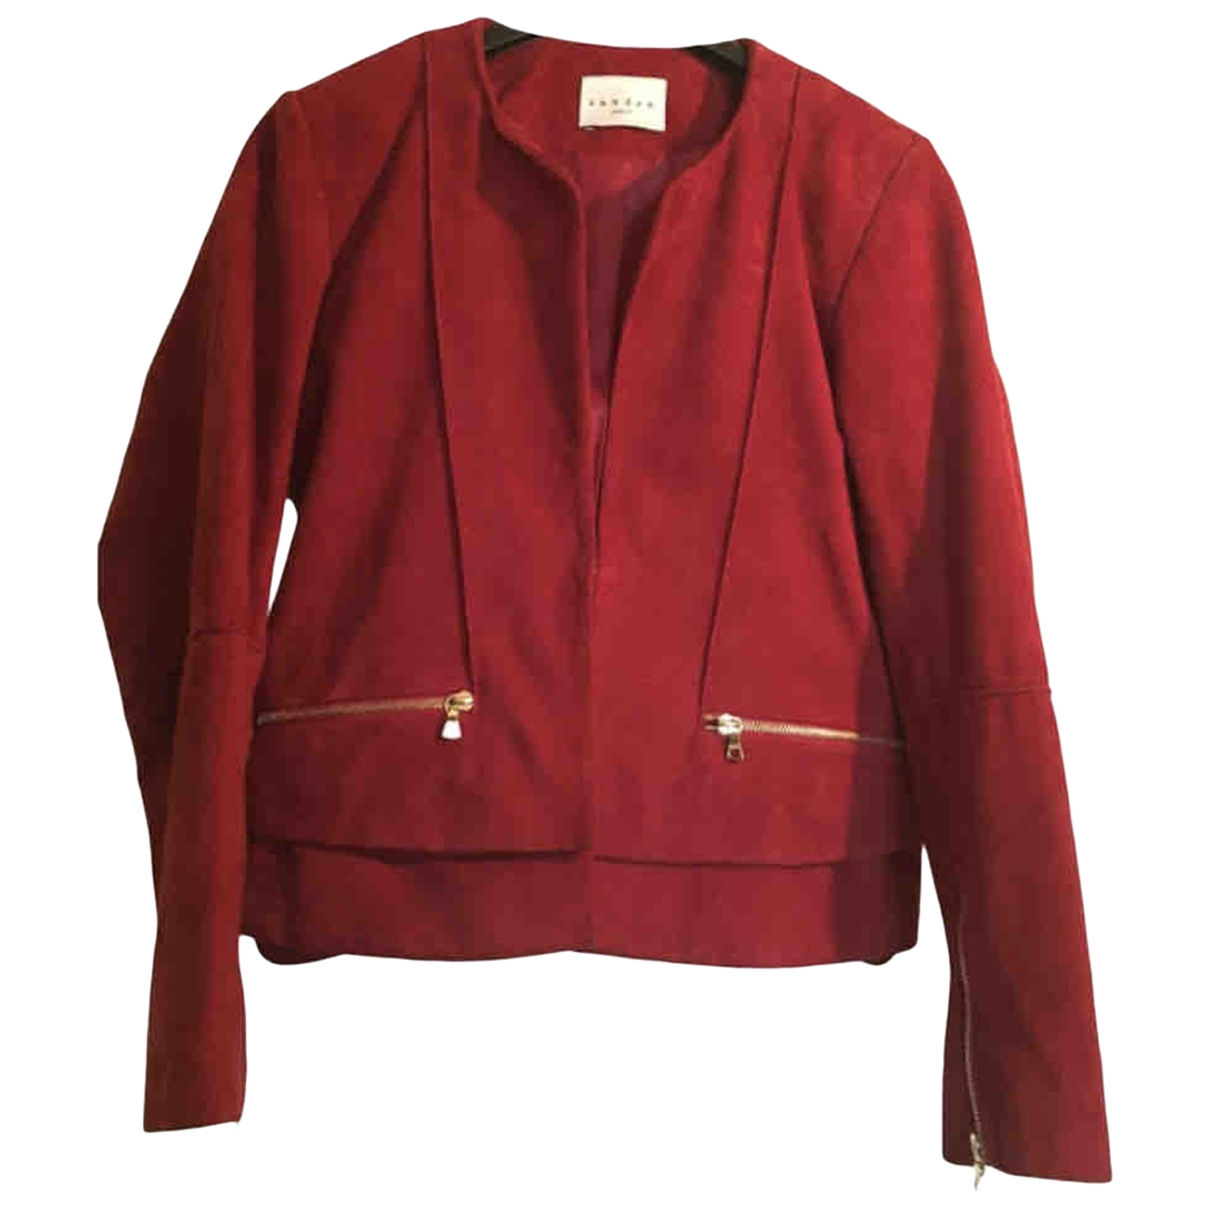 Sandro Fall Winter 2019 Burgundy Suede jacket for Women M International